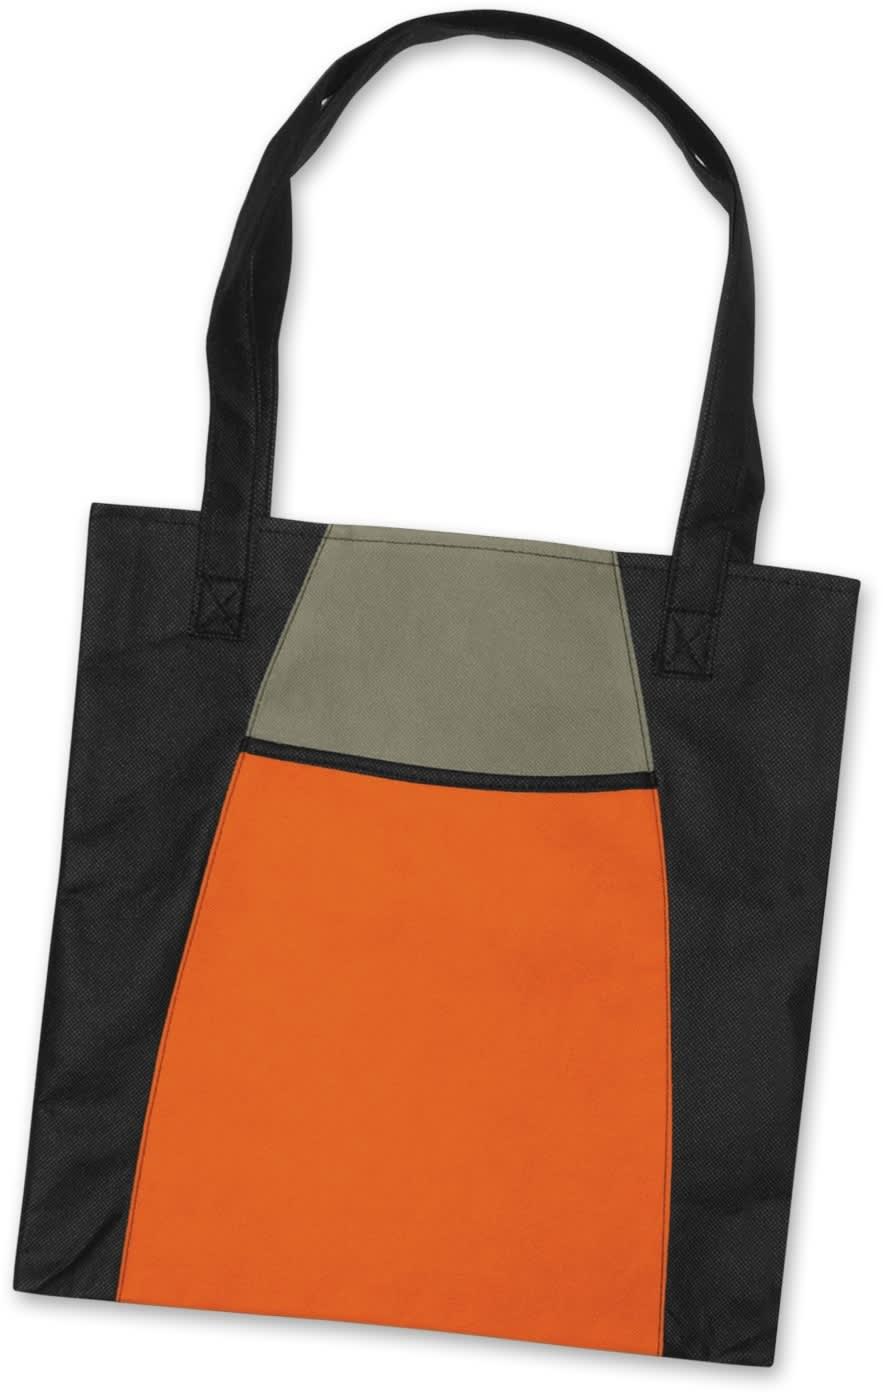 Orange/Black Promo Fashionable Tote Bag